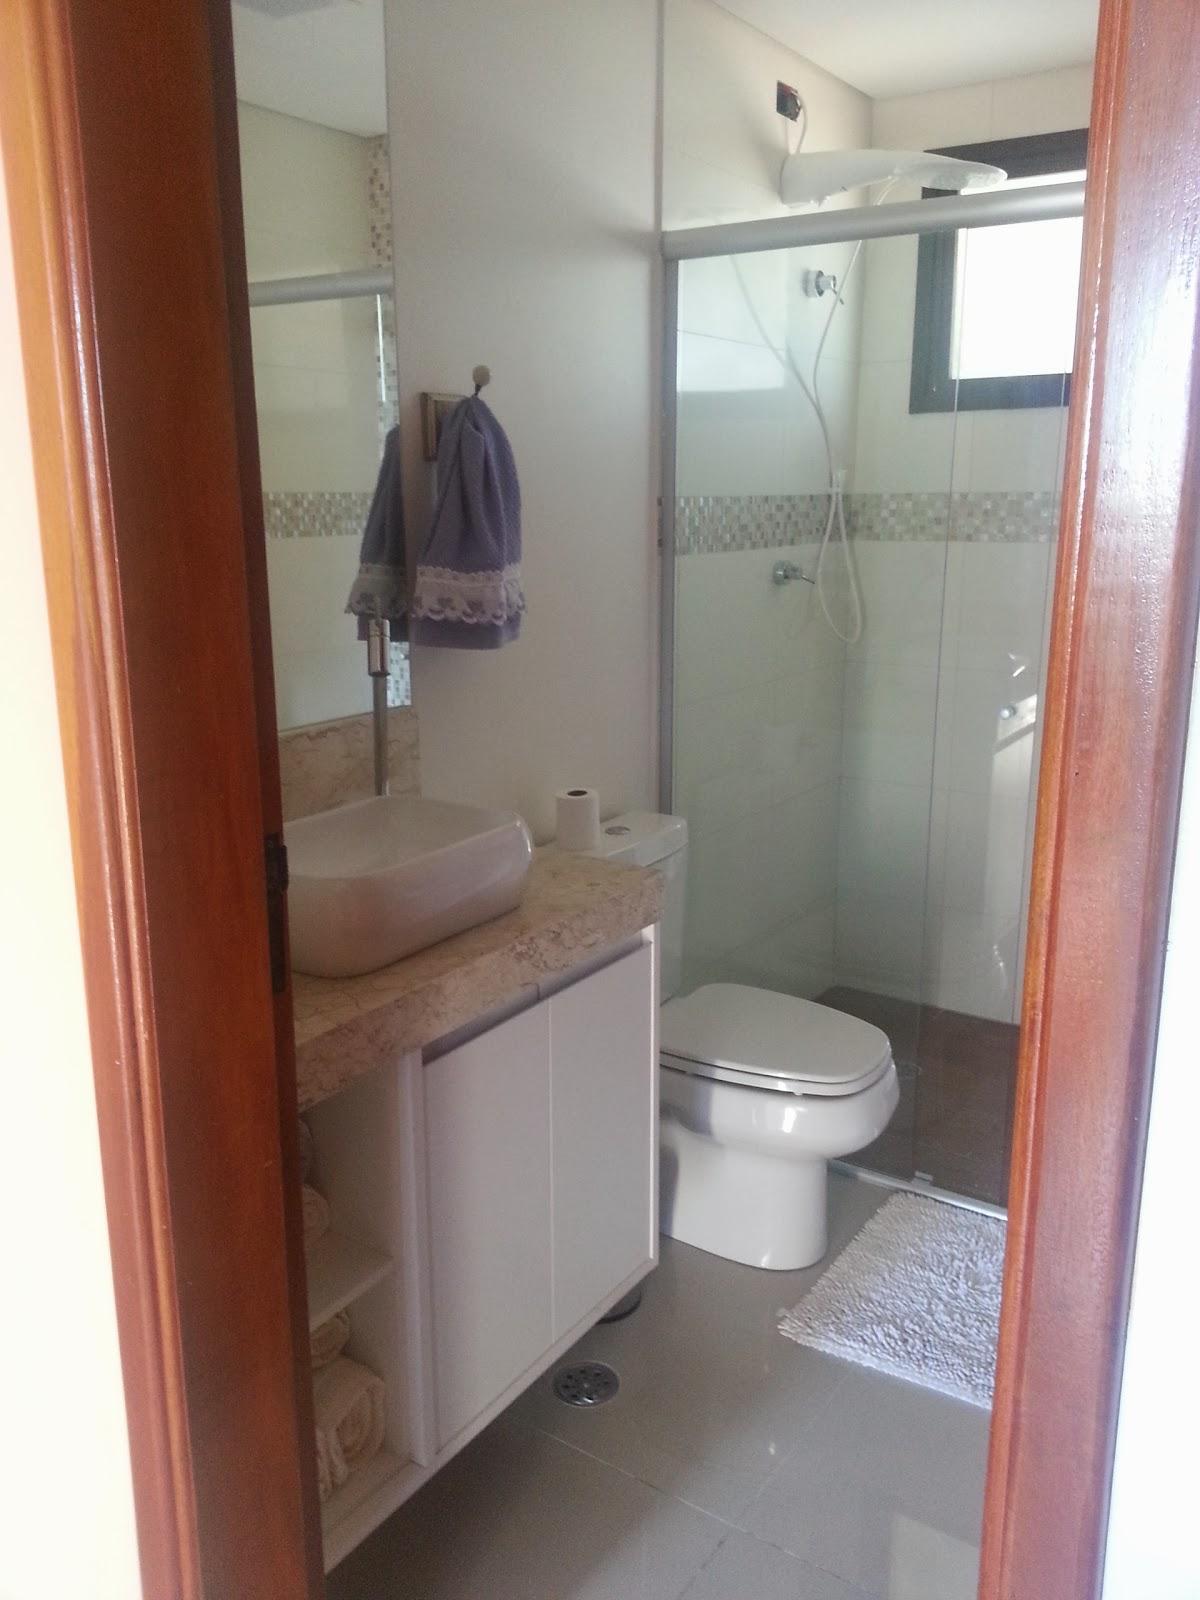 Imagens de #633627 Obs: Falta o marido fechar a tomada do chuveiro! rsrsrs 1200x1600 px 2936 Box Banheiro Fosco